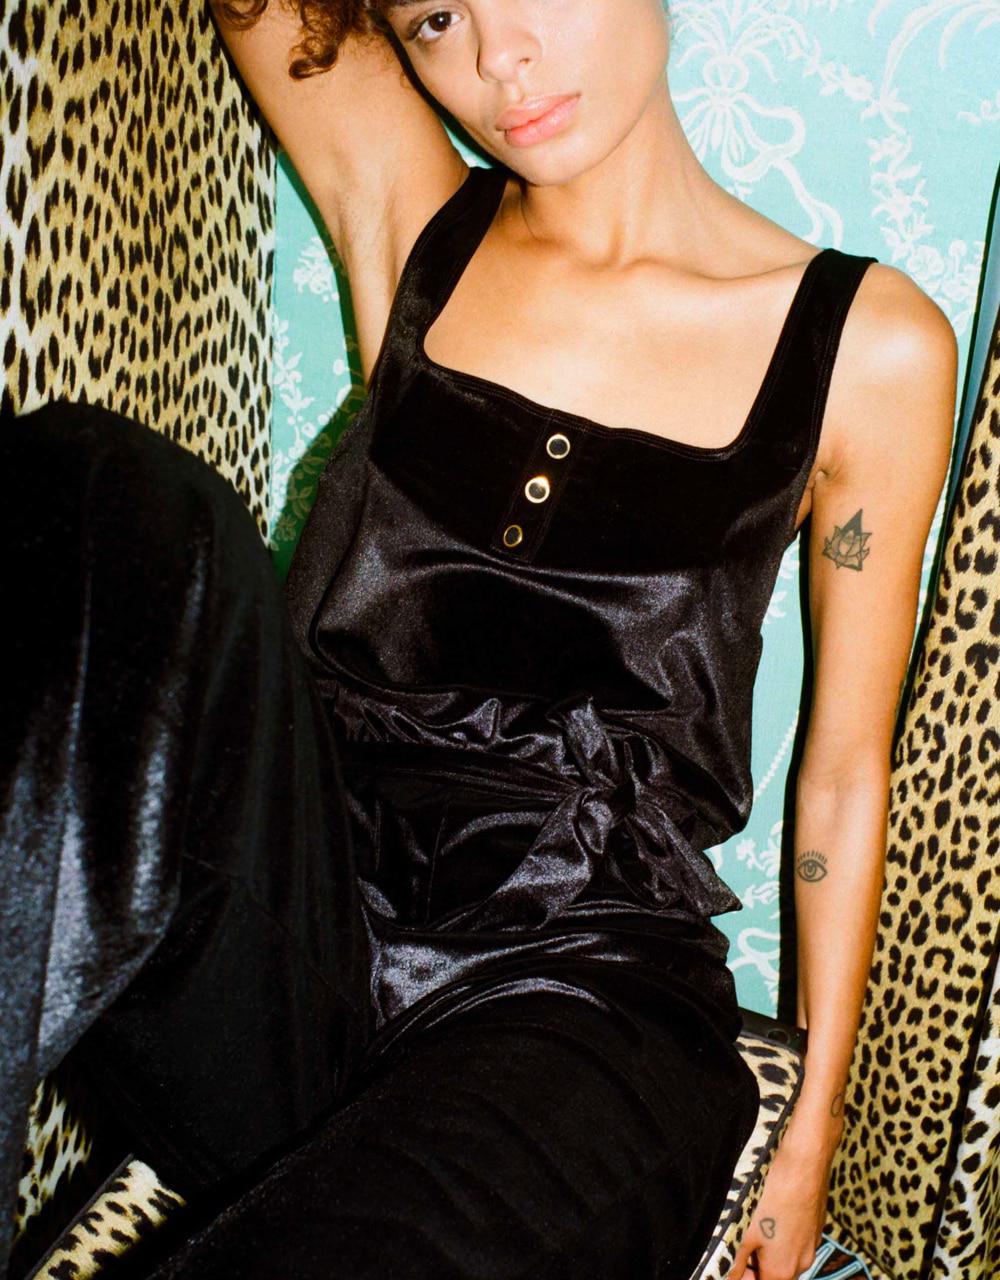 lingerie jumpsuit Charlie velvet Black Storm 59 € Girls In Paris photo 2